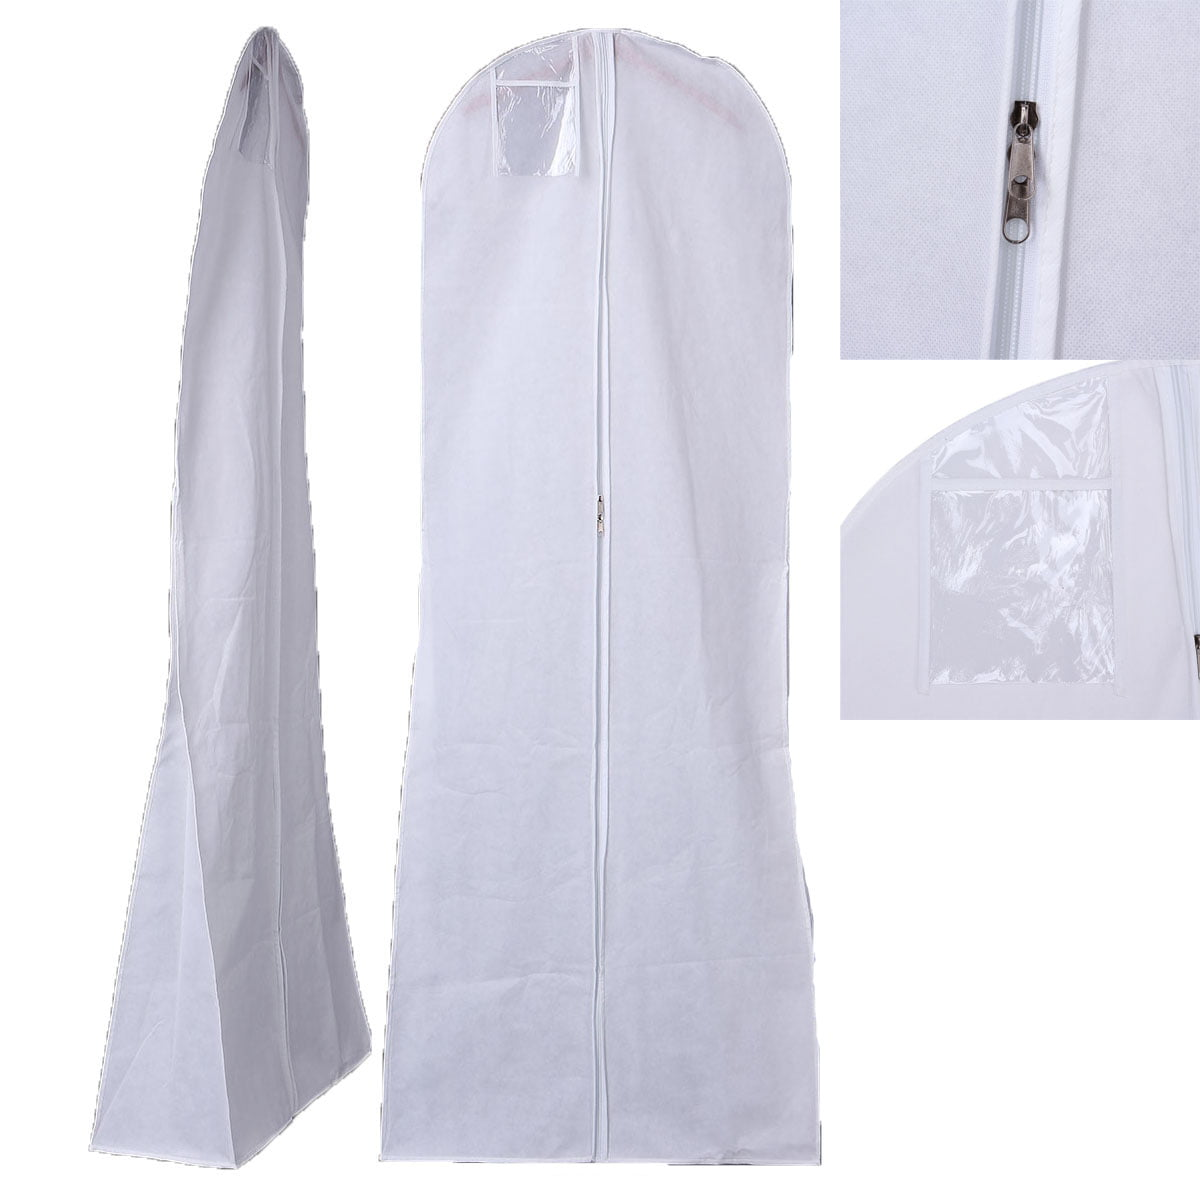 5 Pink Breathable Cloth Wedding Gown Dress Garment Bag